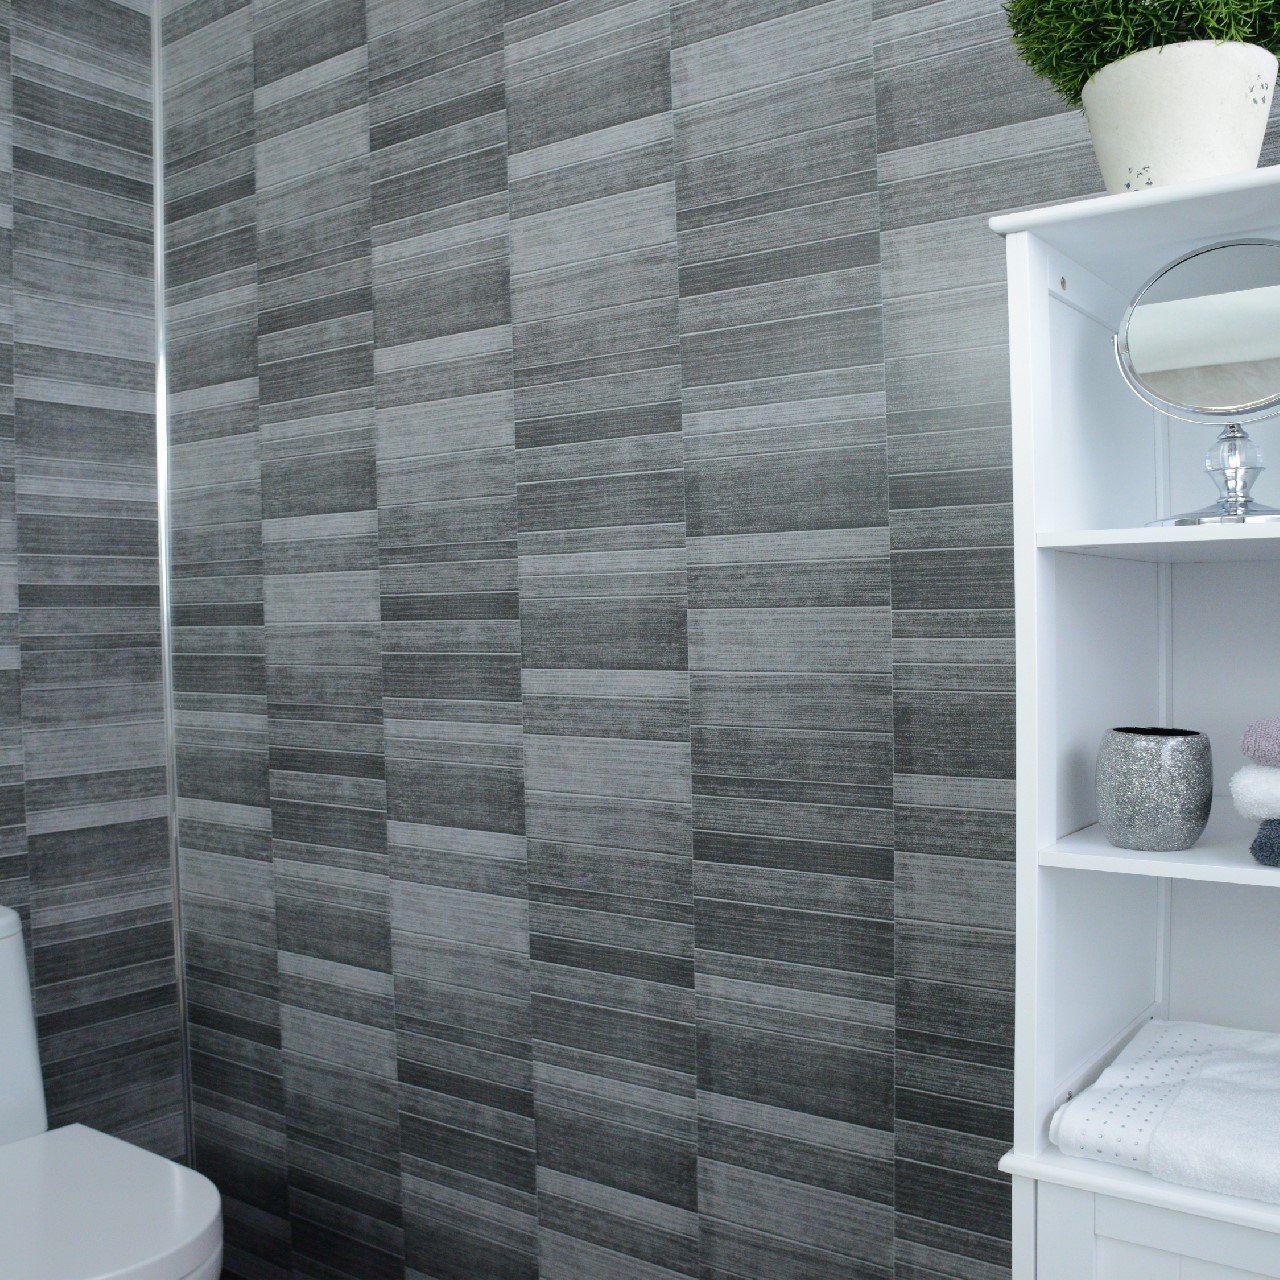 Dark Grey Bathroom Wall Panels Cladding Panels Kitchen Shower Wetrooms 100 Waterproof By Claddtech Bathroom Wall Panels Gray Bathroom Walls Cladding Panels